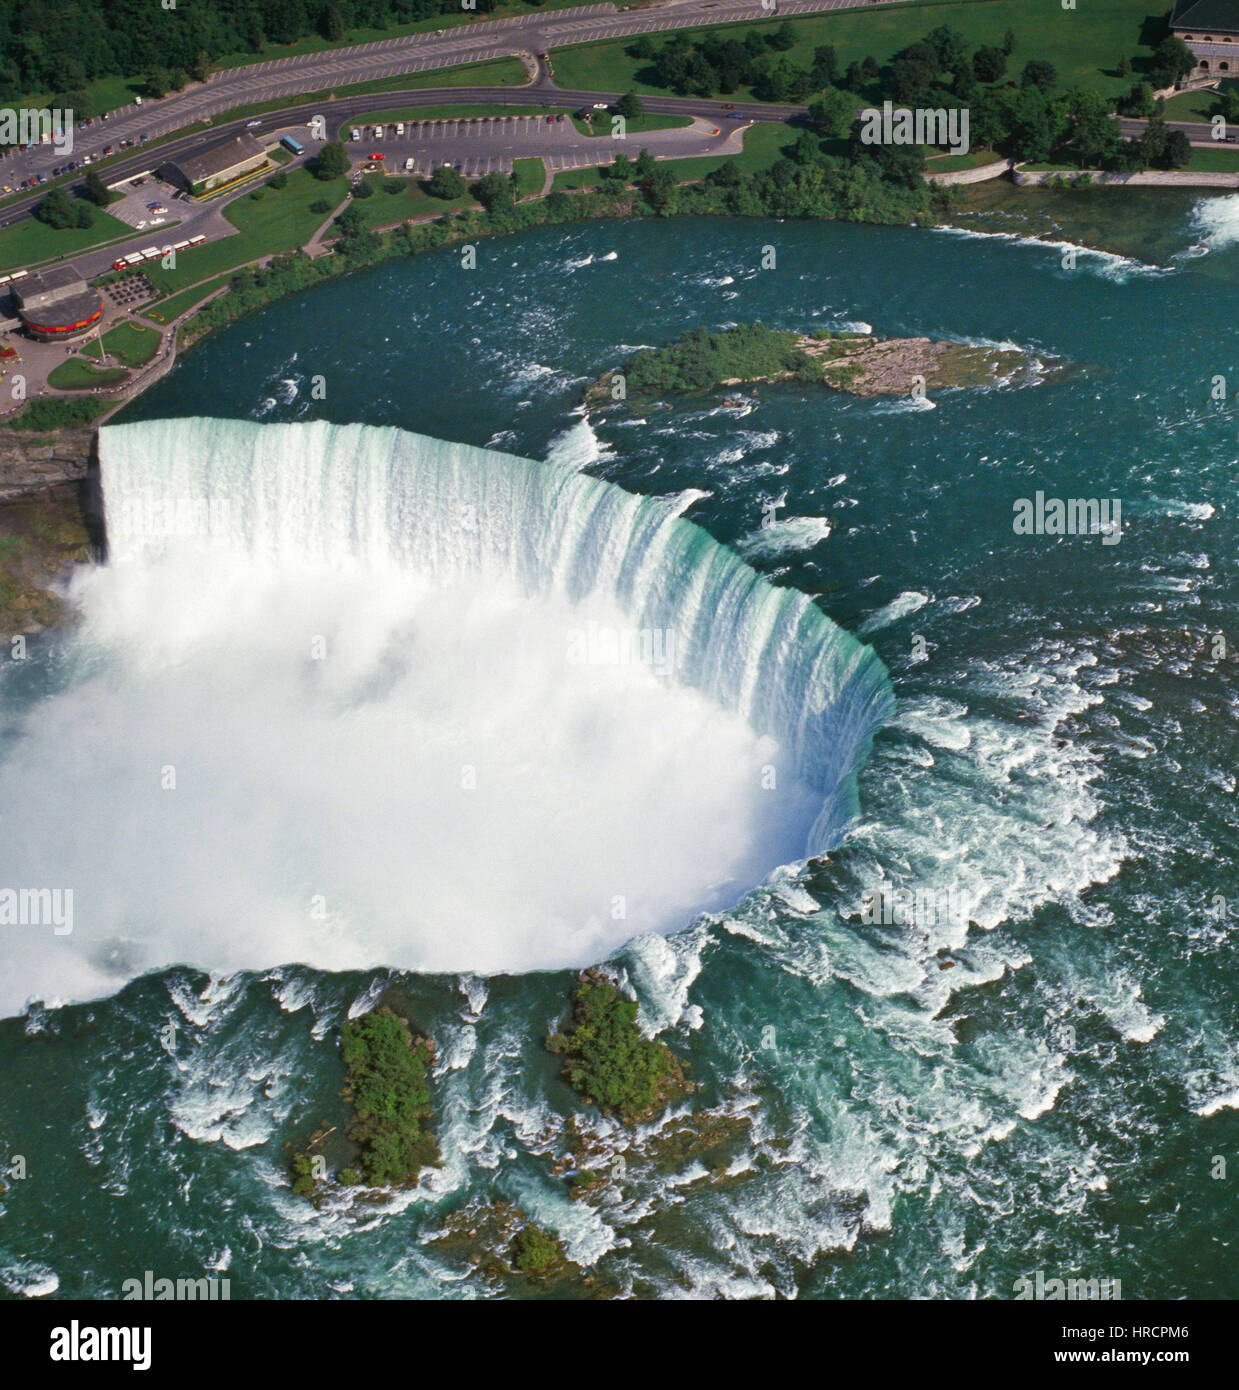 Aerial view of Niagara Falls, Ontario, Canada - Stock Image